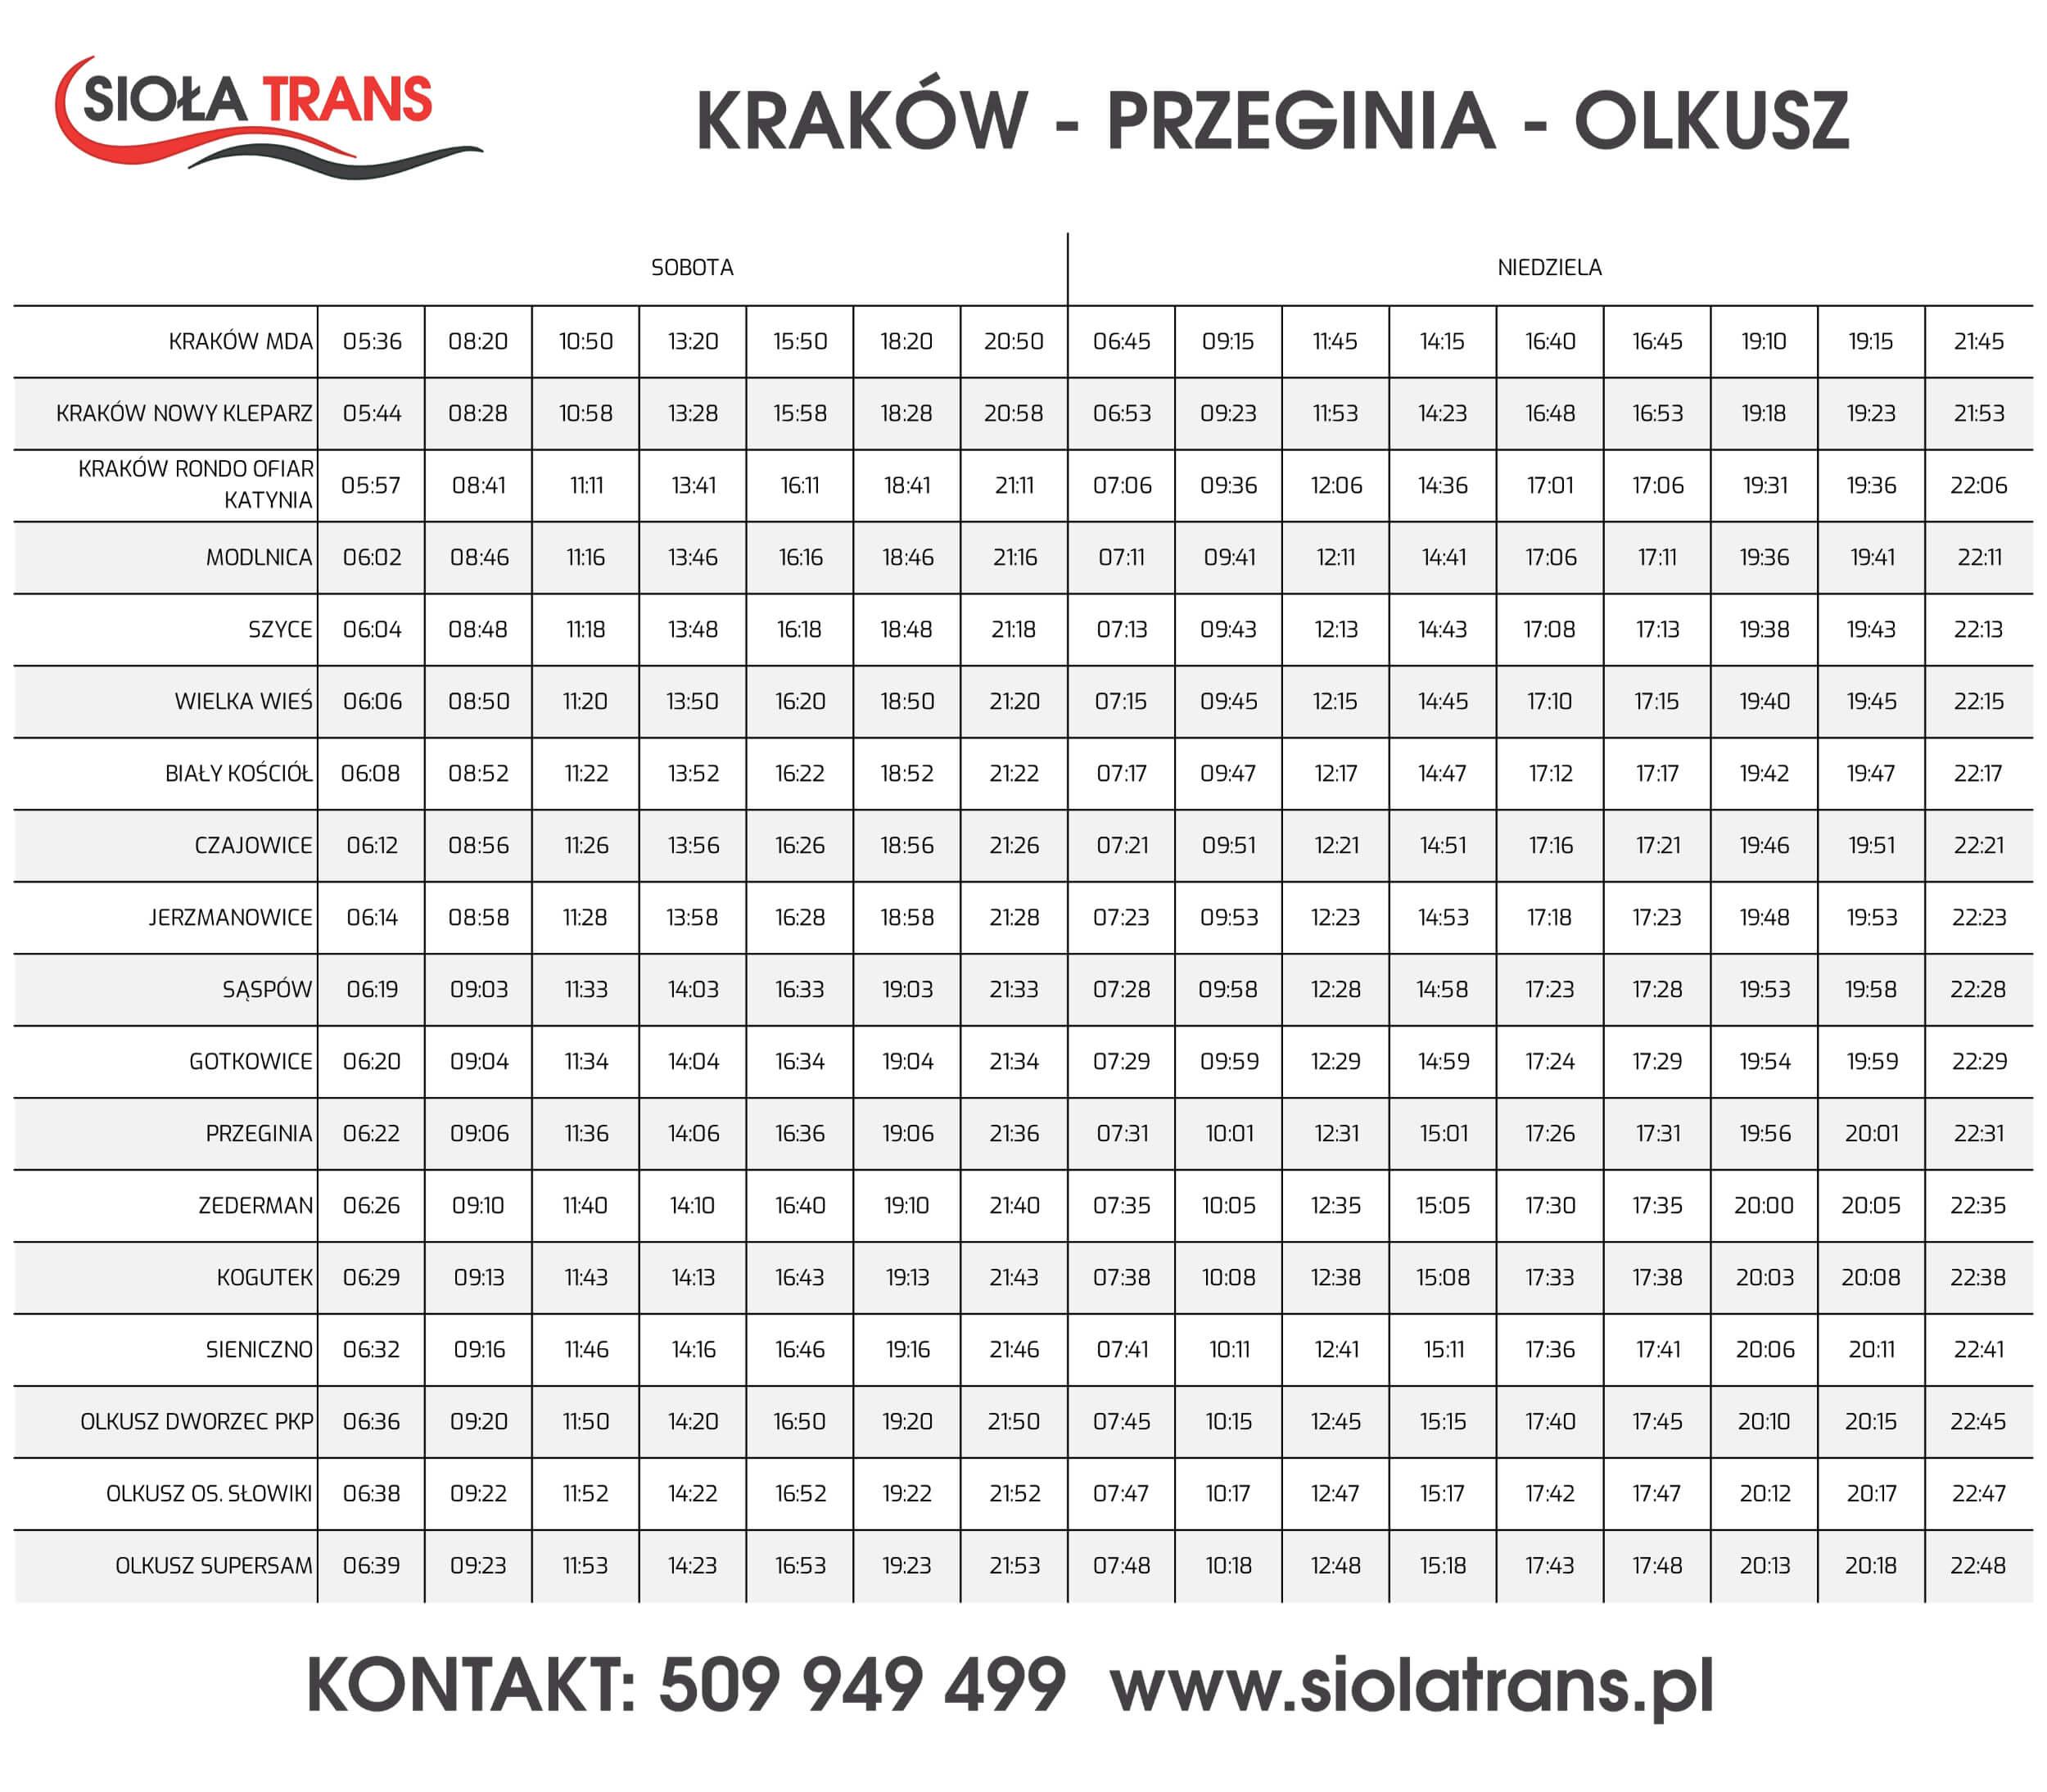 siola_trans_krakow_olkusz_wknd